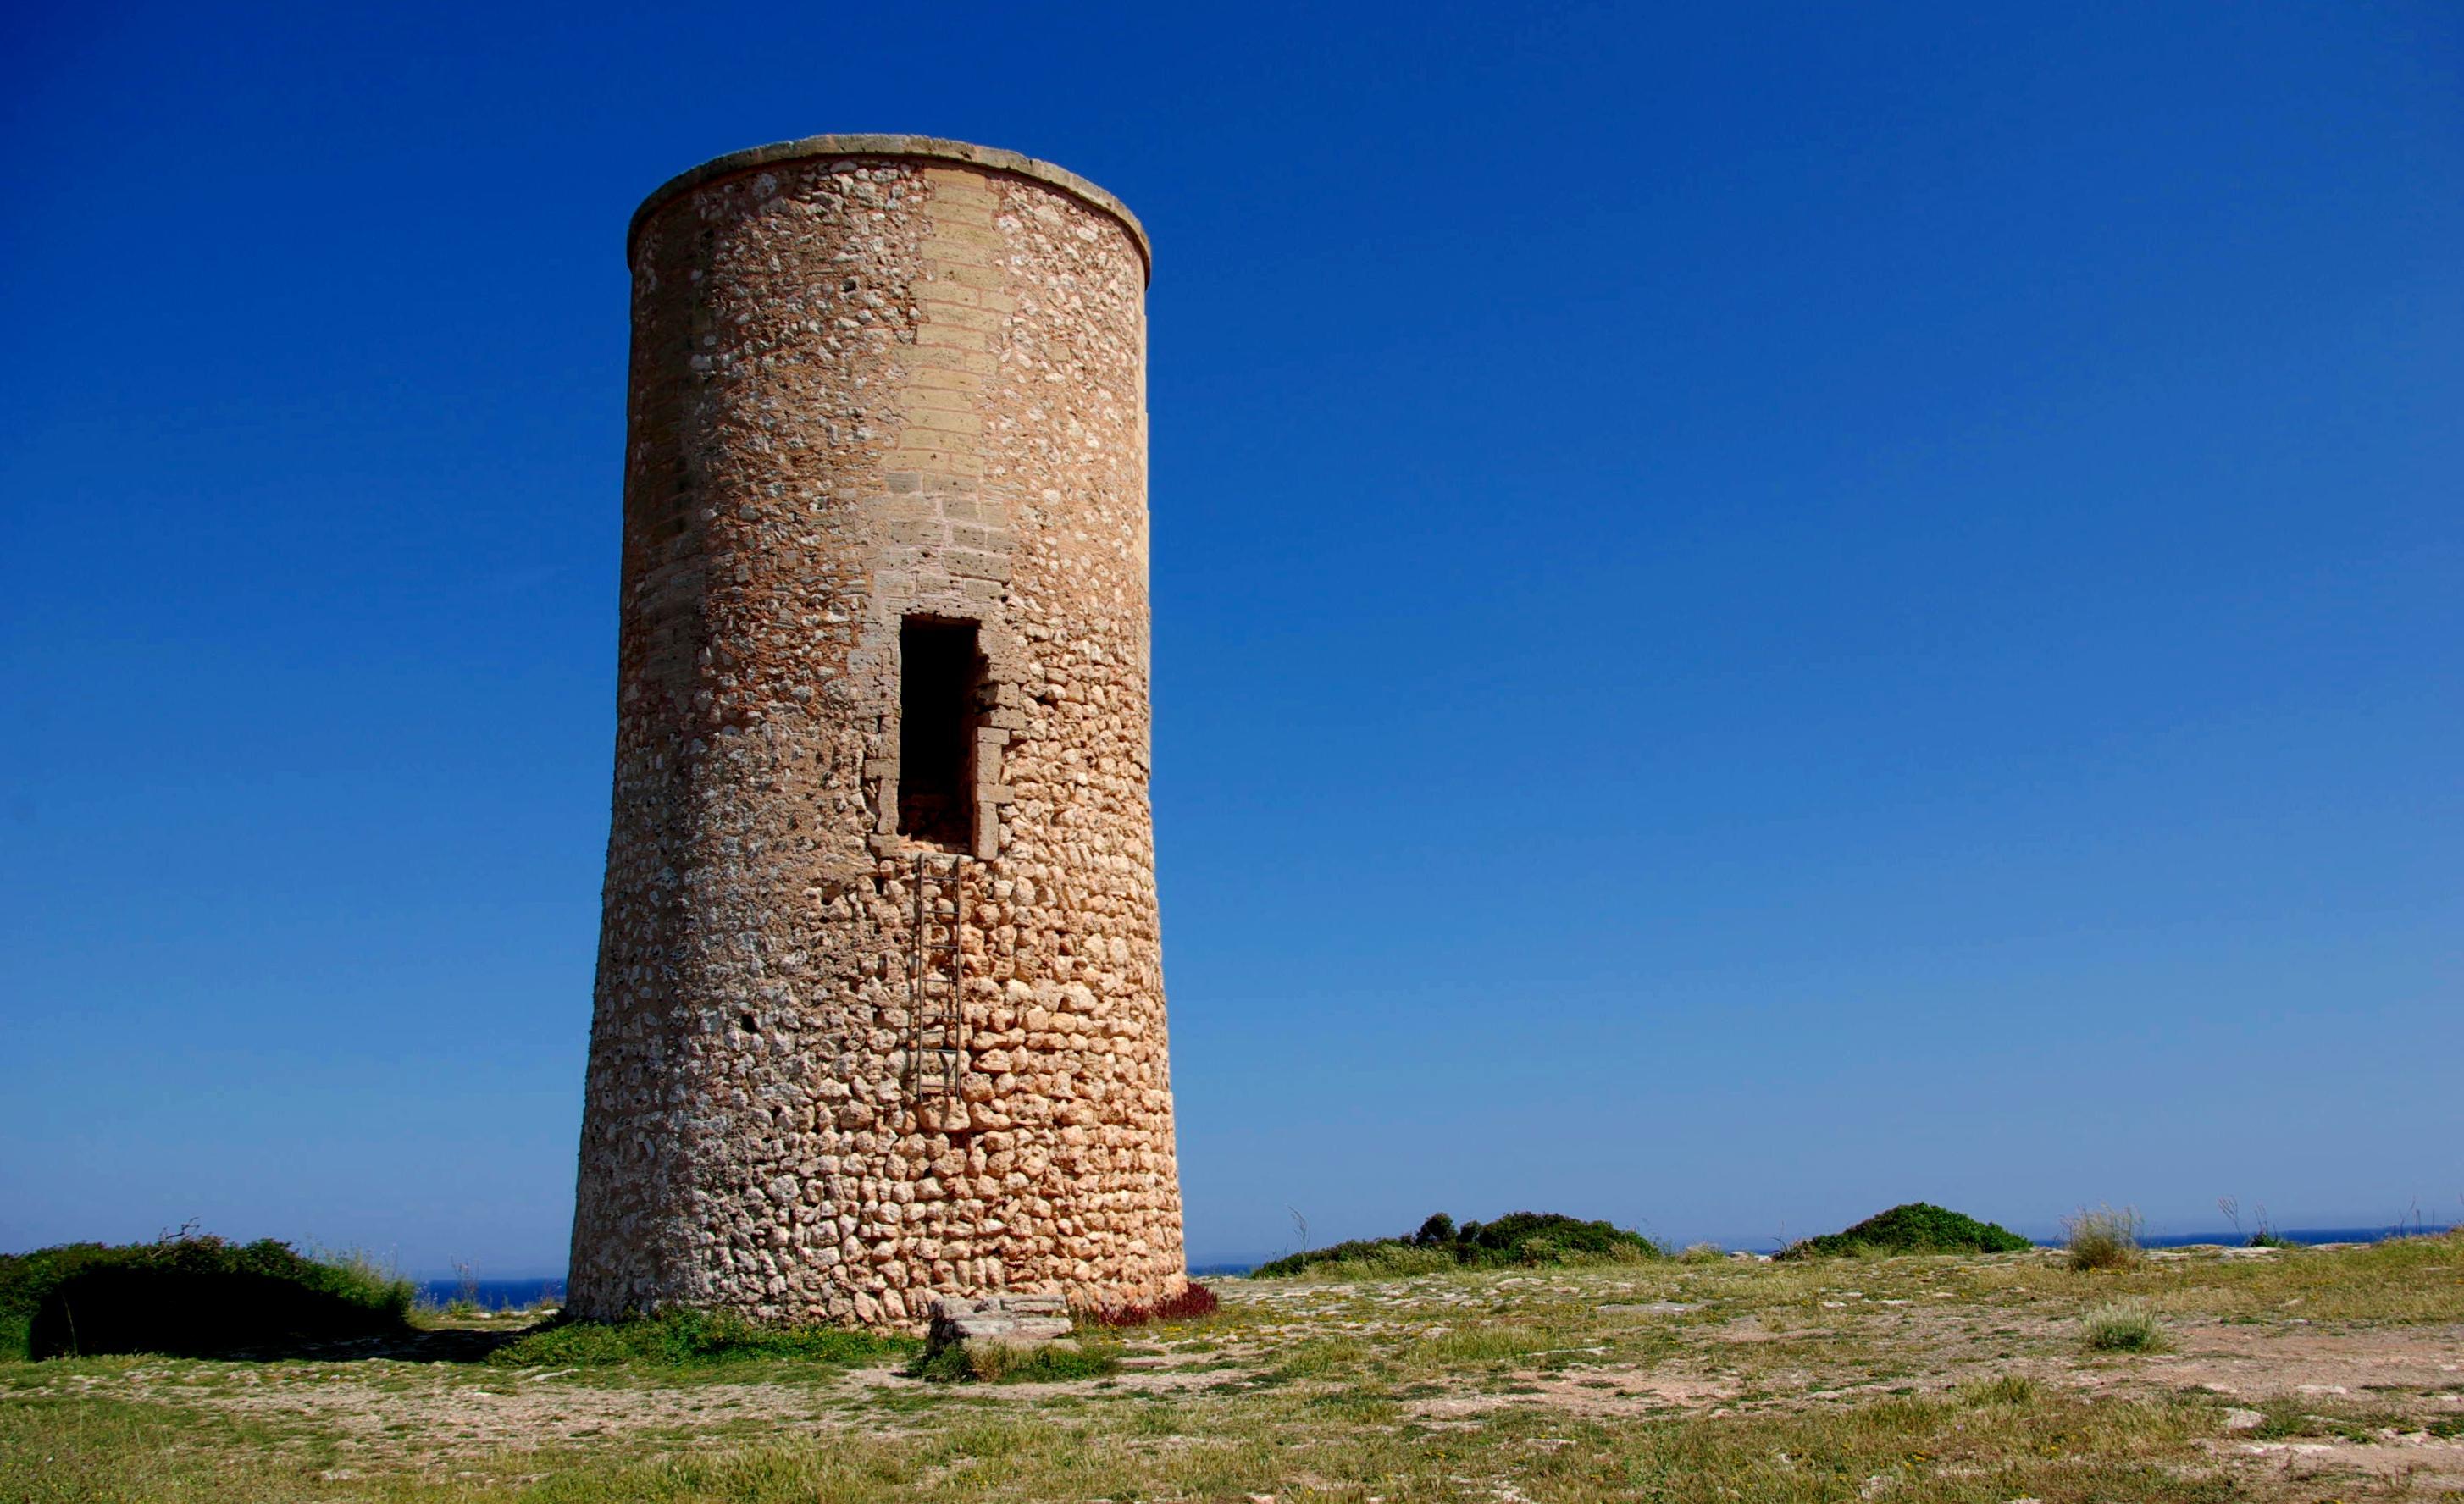 Foto playa Cala Murta. Torre Torre dels Falcons  -  Porto Cristo -  Mallorca - Buy a print in - http://cafate.blogspot.com/